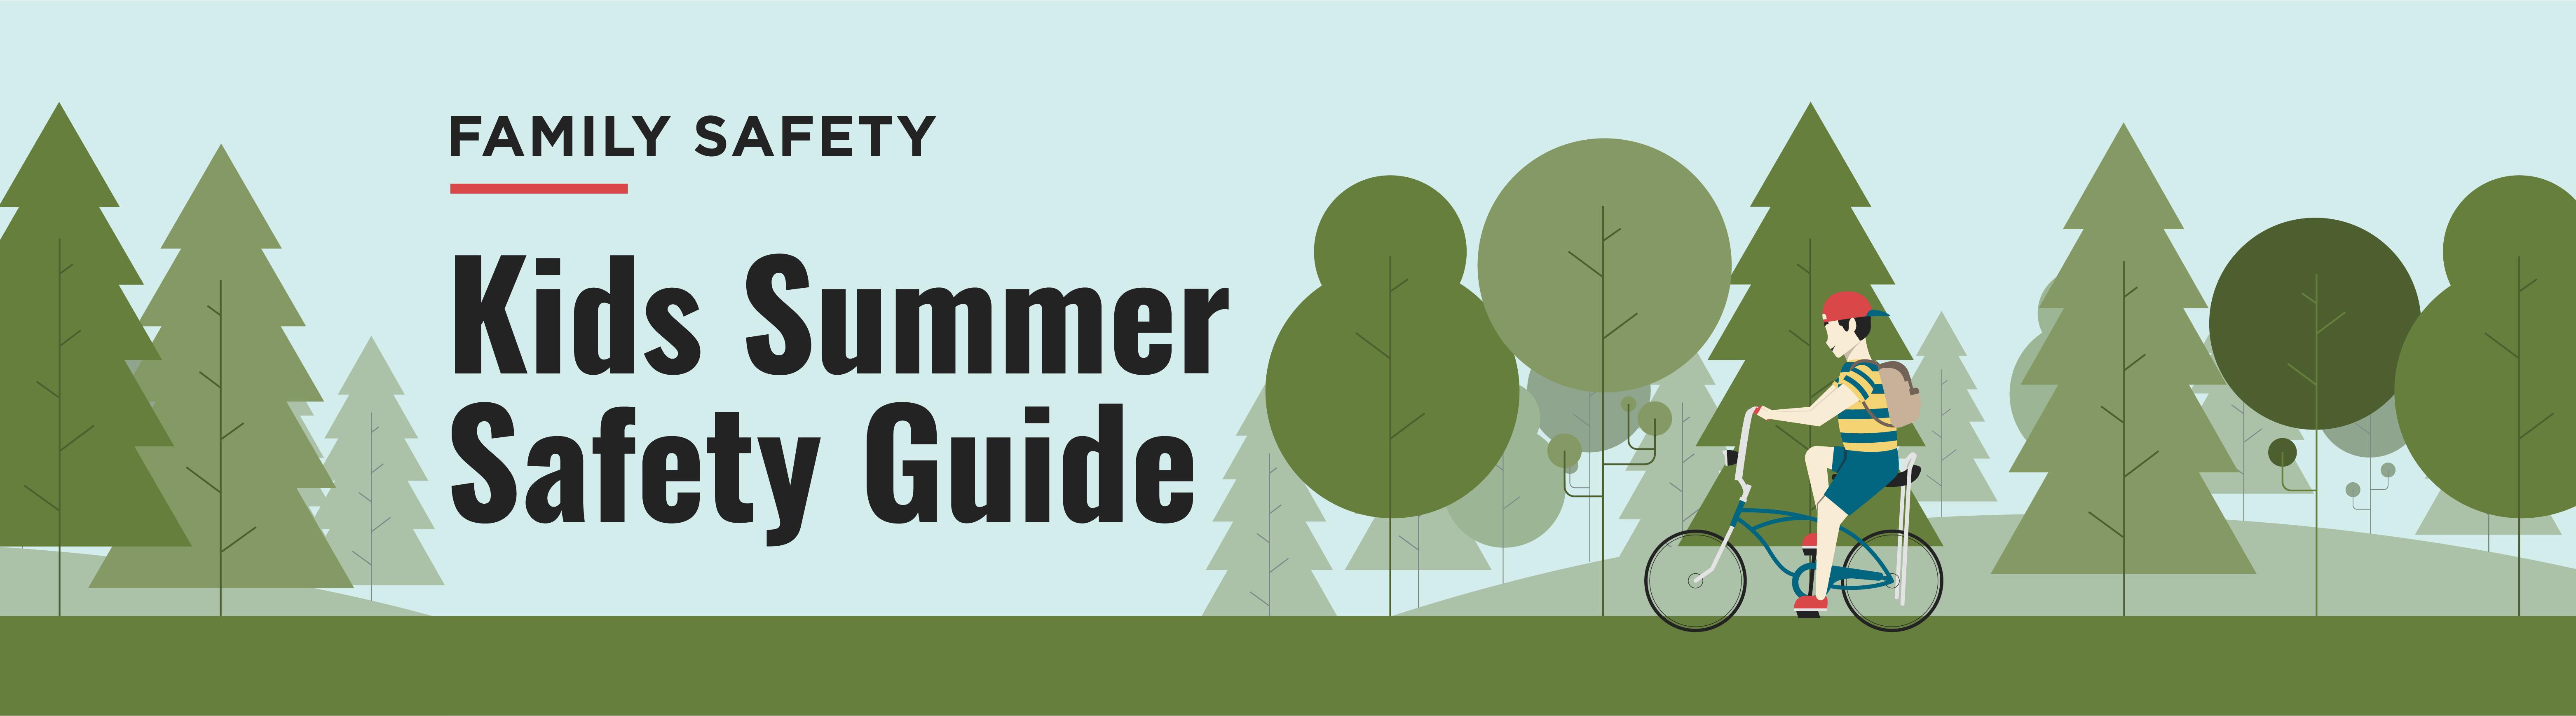 Kids Summer Safety Guide